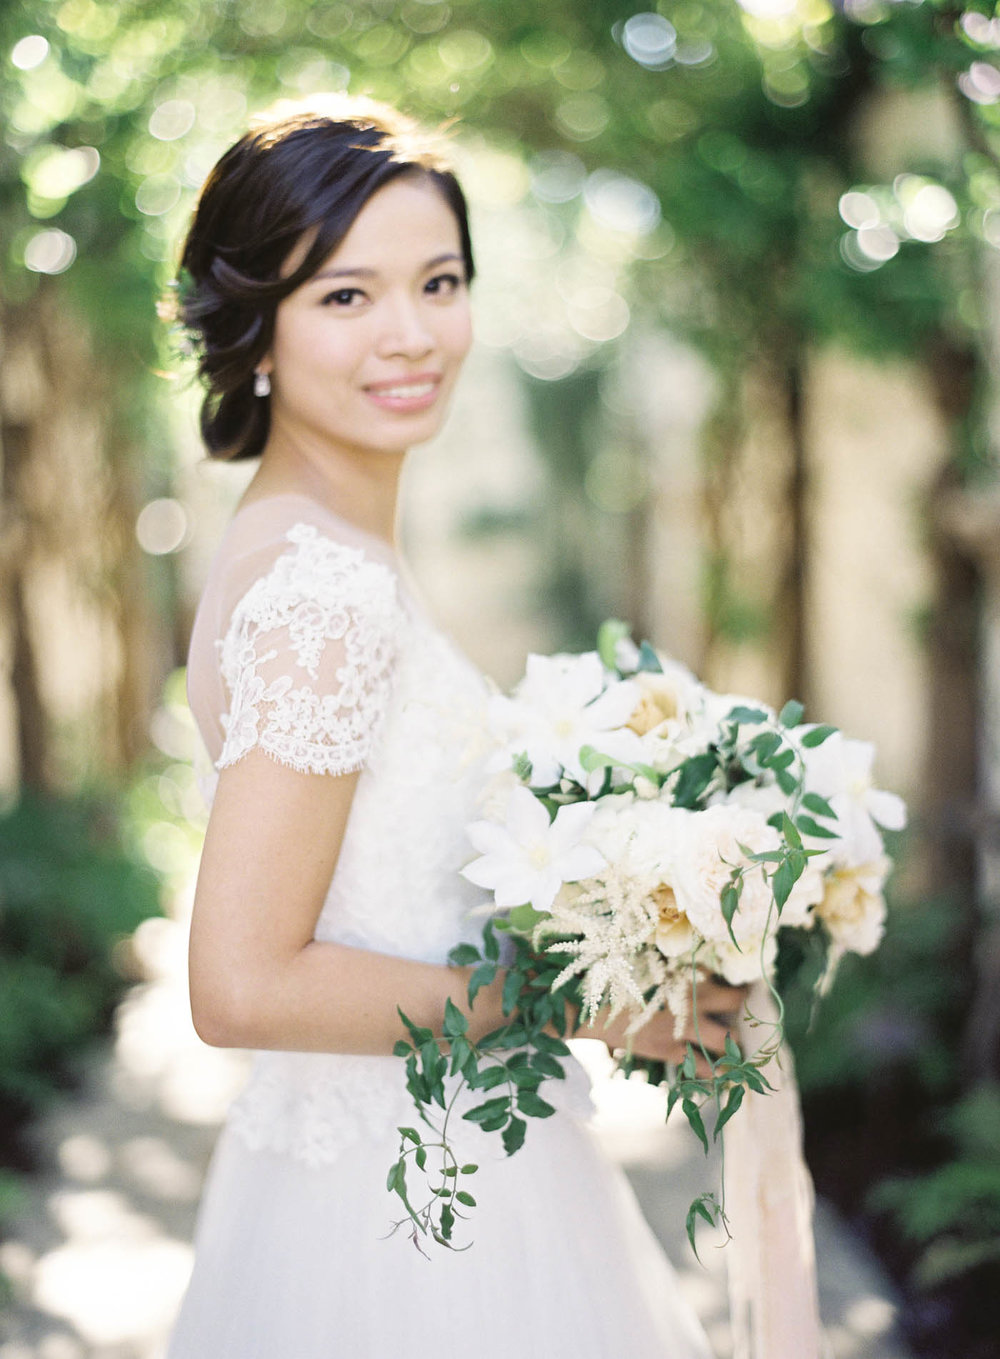 san-juan-capistrano-wedding-jen-huang-7.jpg